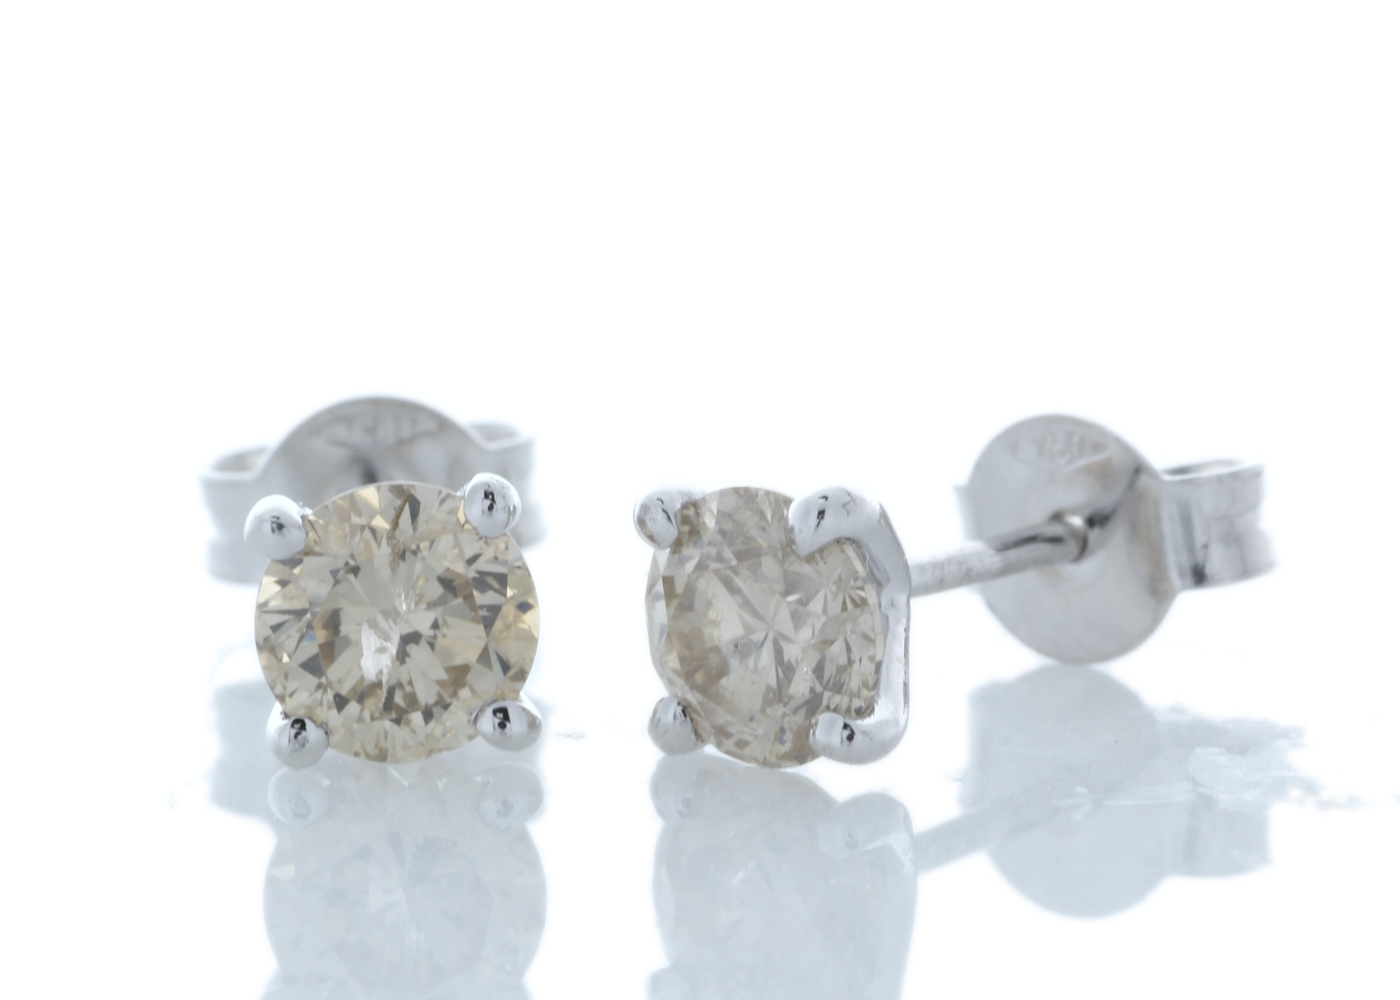 Lot 36 - 18ct White Gold Prong Set Diamond Earrings 1.22 Carats